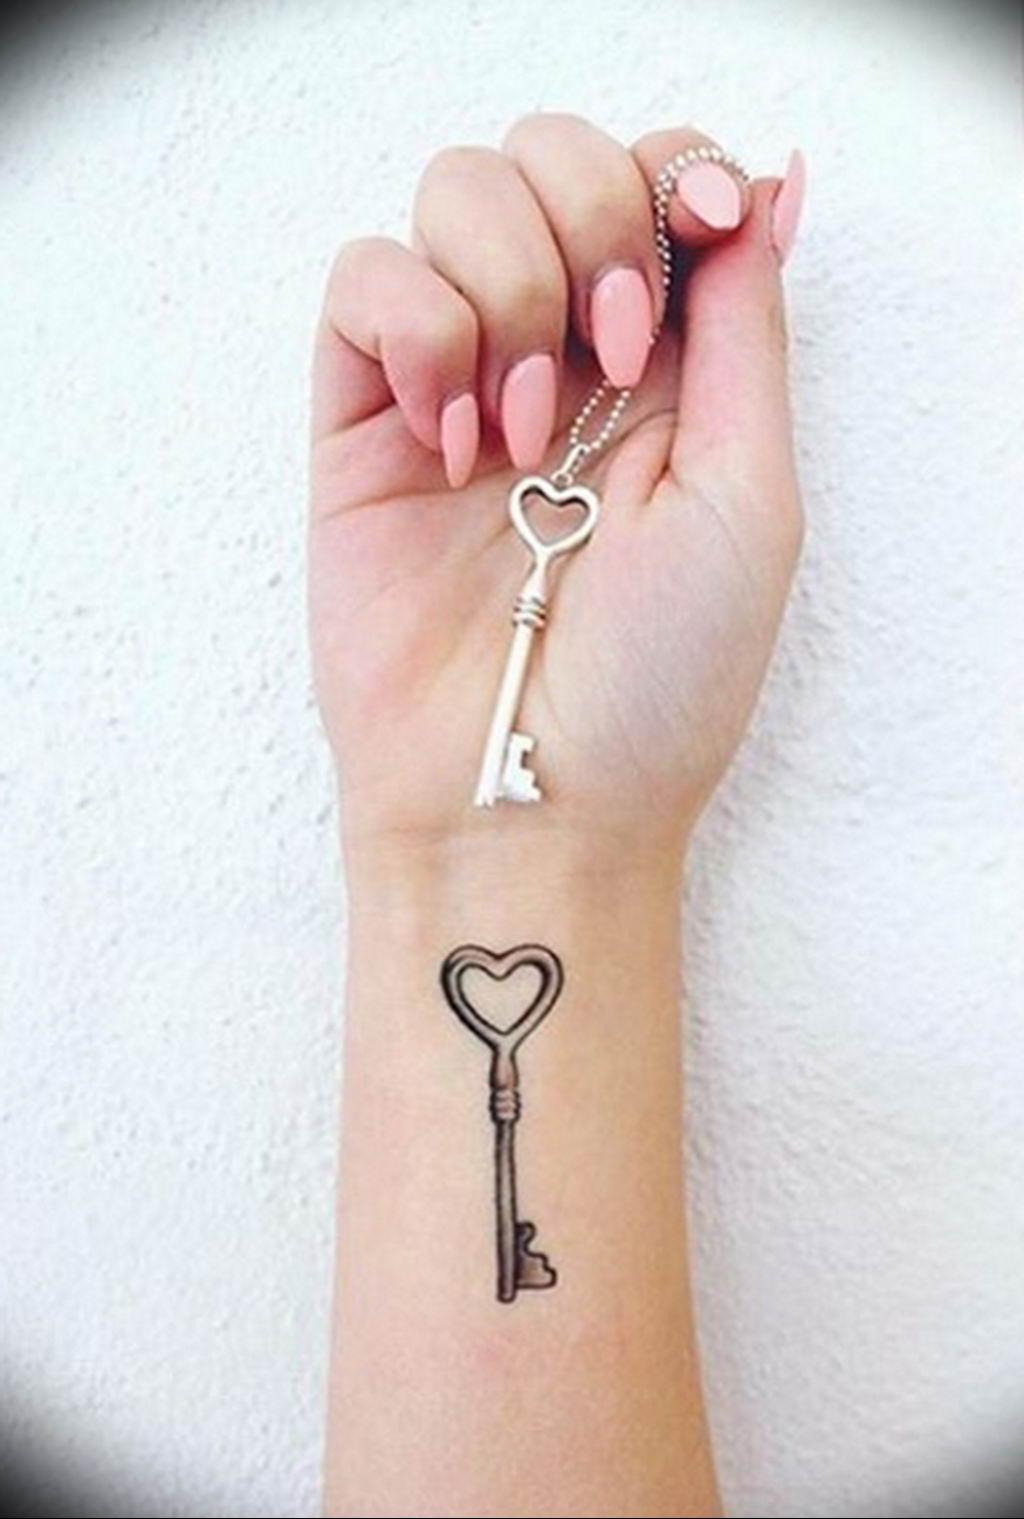 Фото тату для девушек ключ 21.08.2019 №019 - tattoo for girls key - tatufoto.com